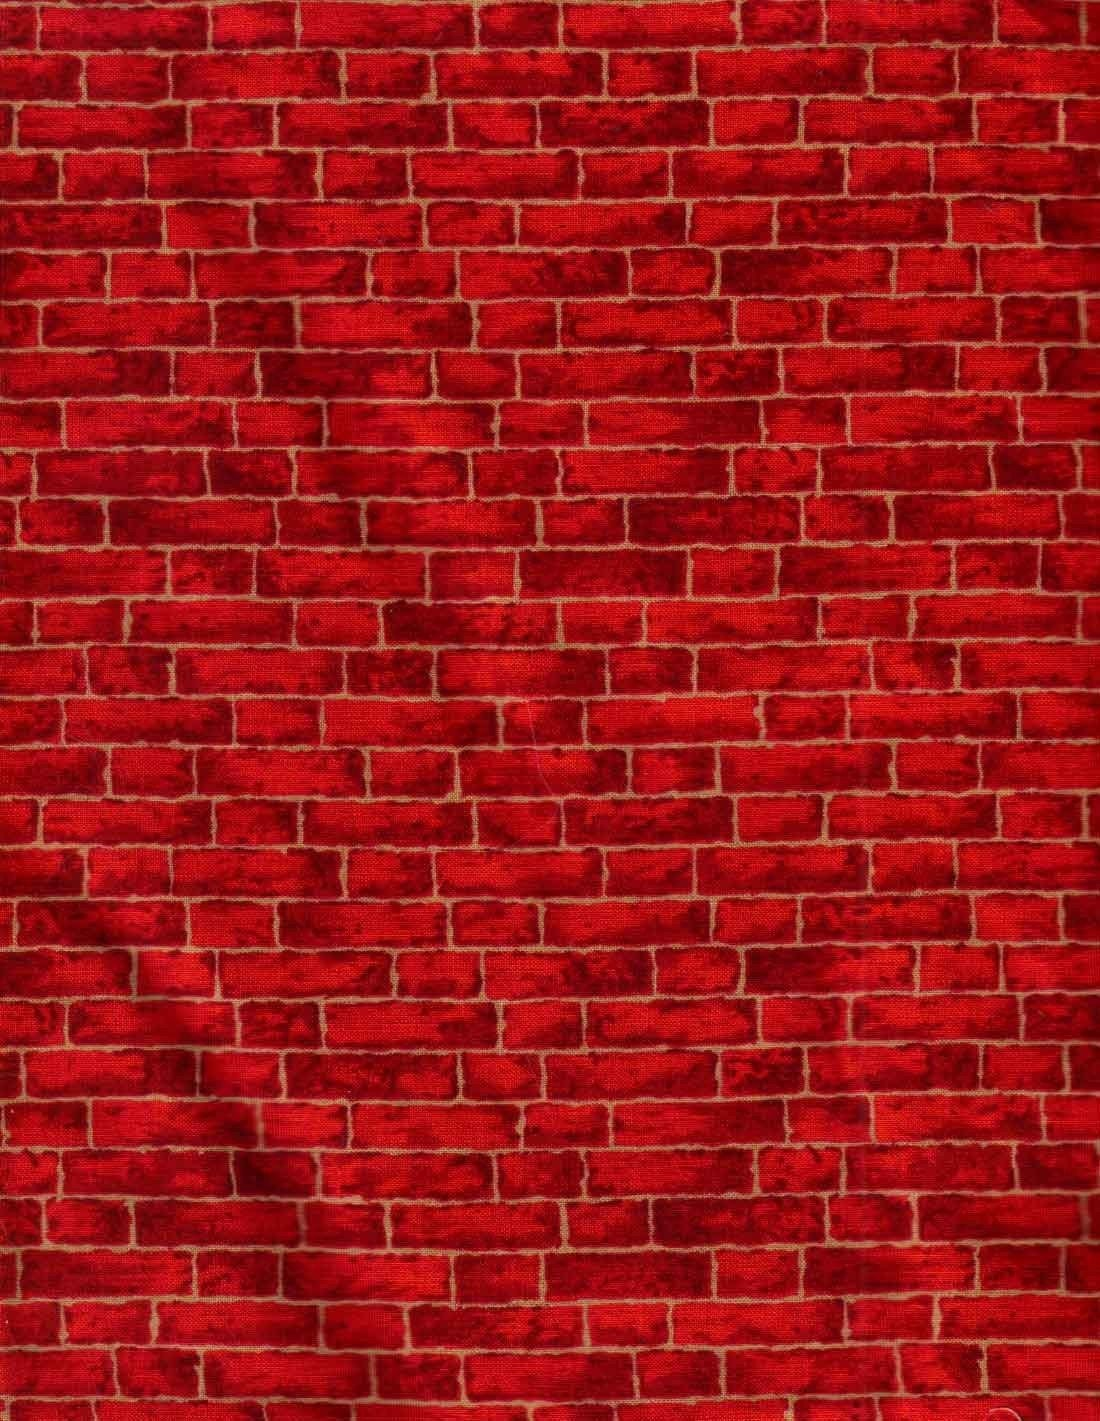 and red brick - photo #25